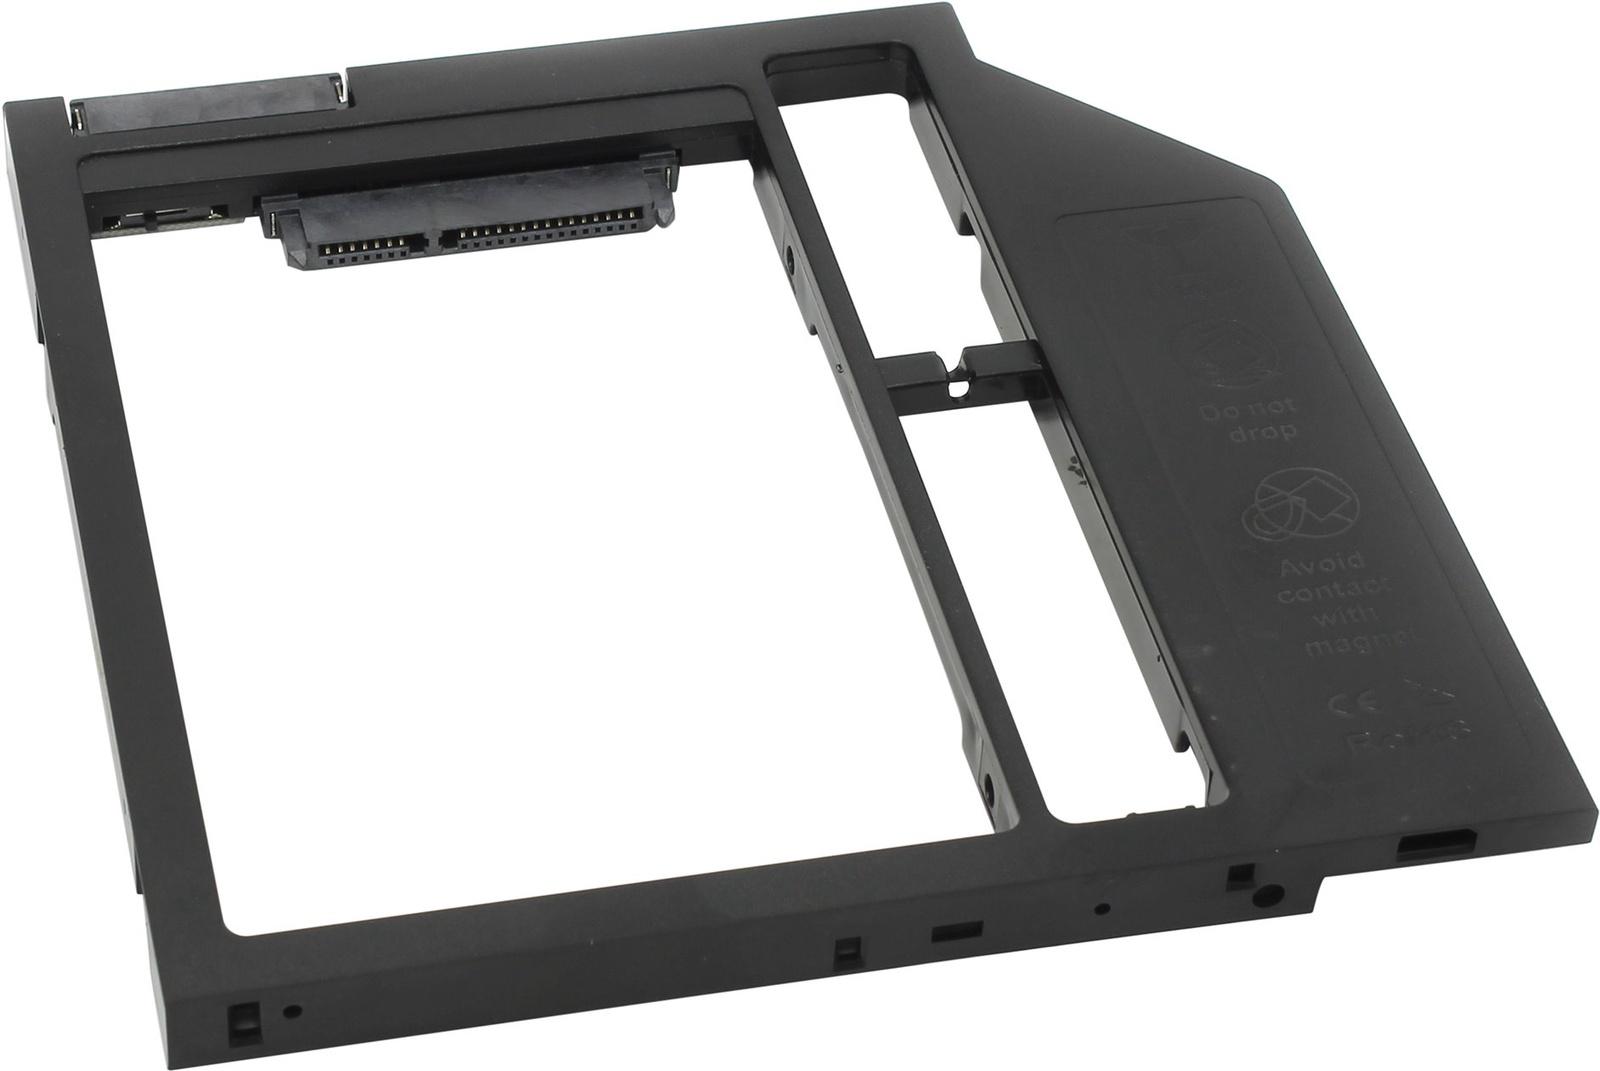 SS90, Адаптер для подключения HDD 2,5 дюйма к ноутбуку вместо DVD внешний контейнер для hdd 2 5 sata agestar subcp1 usb2 0 белый